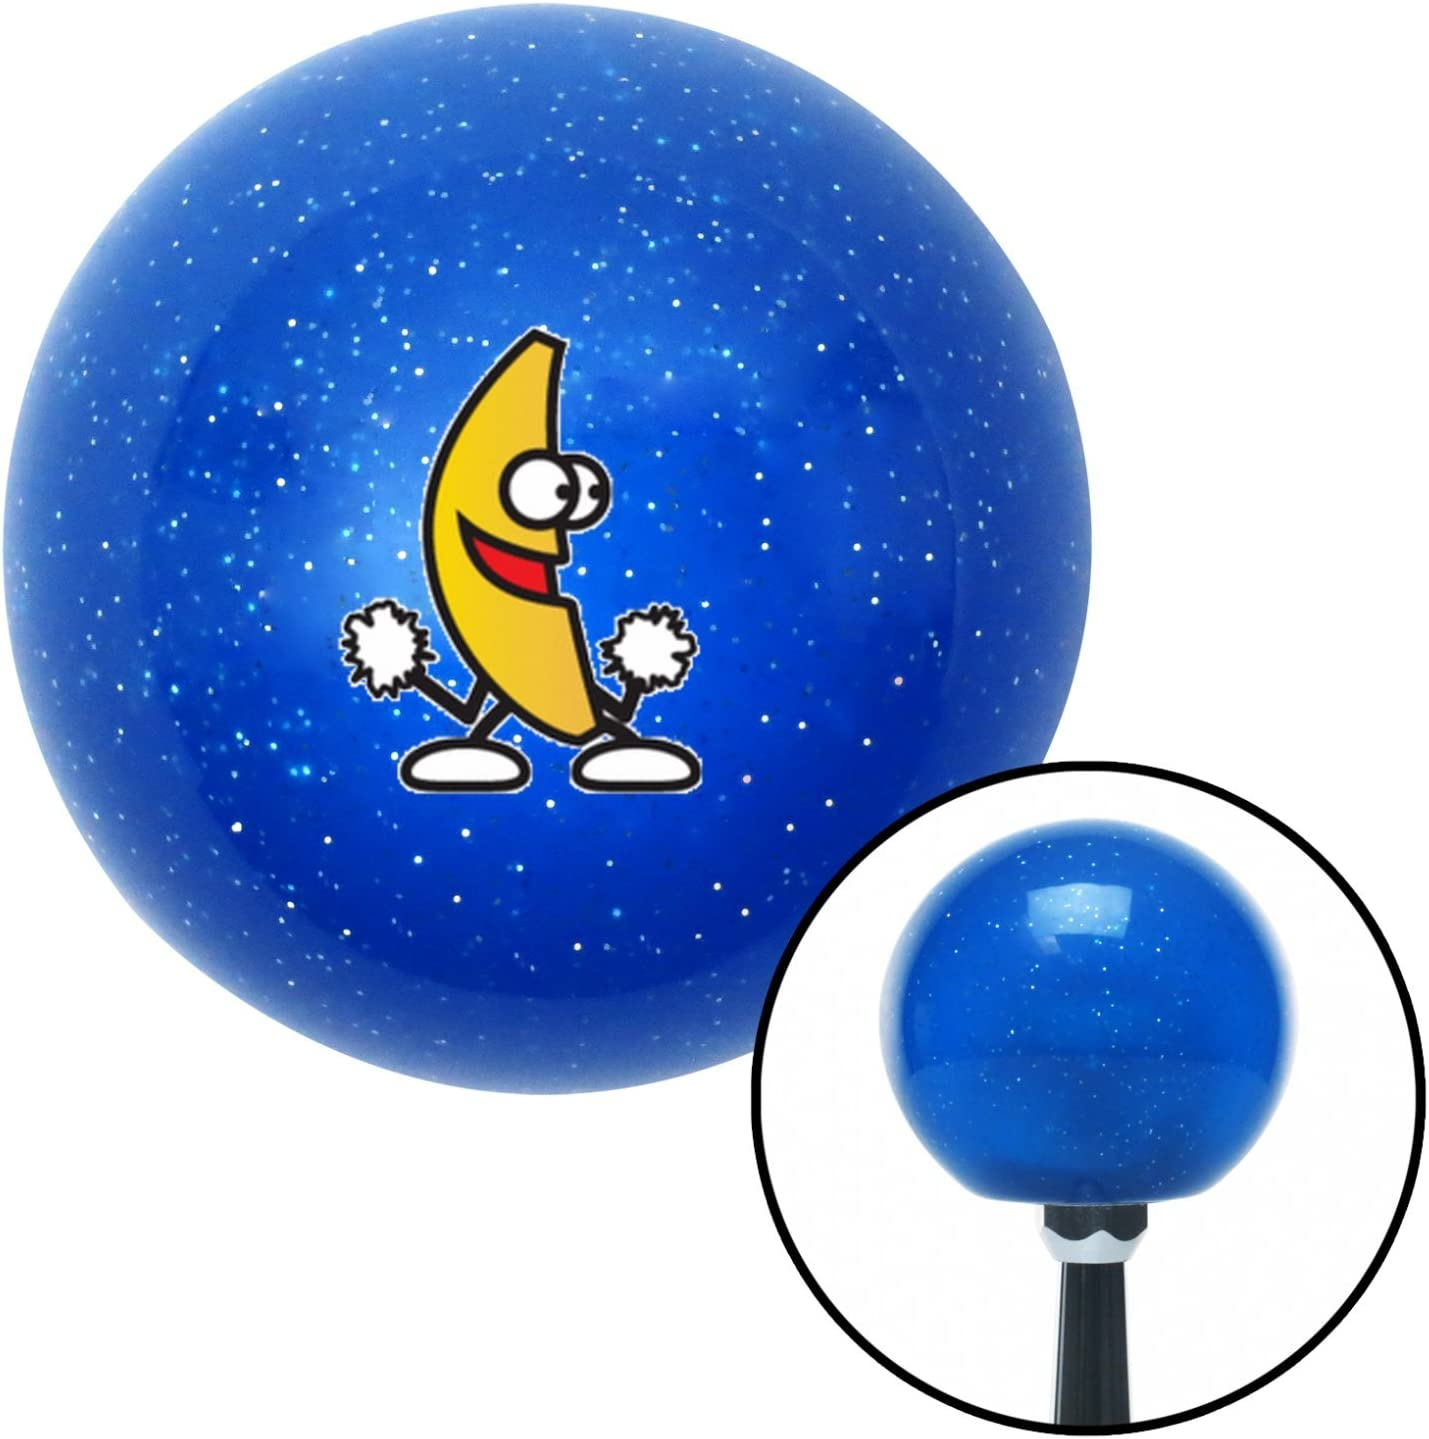 American Shifter 14672 Flying Eye Ball Shift Knob